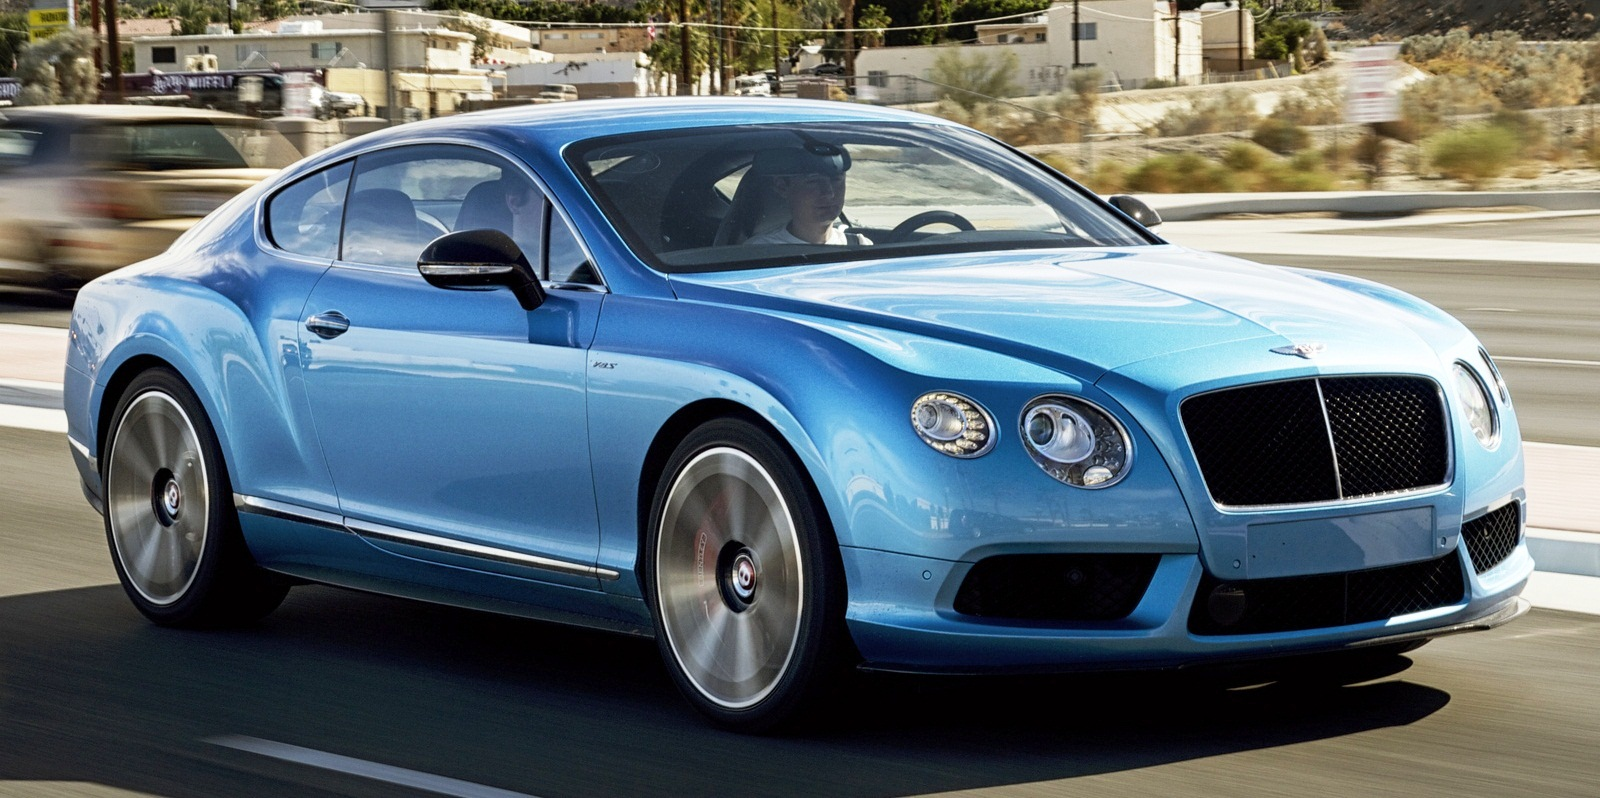 2015 bentley gt sports car education sports bonds news fashion